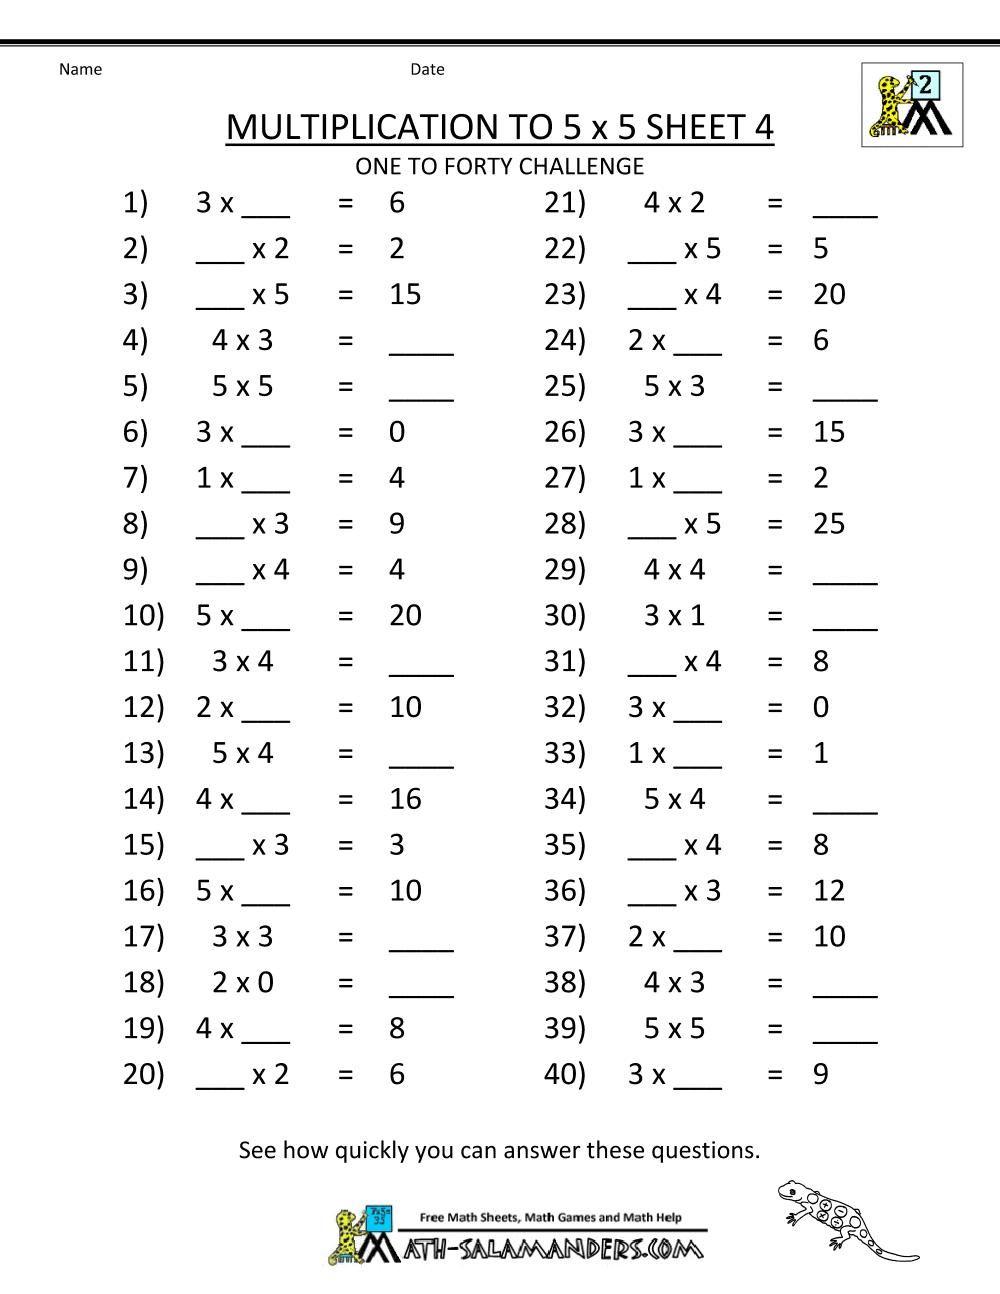 Multiplication Worksheets Grade 3 Coloring | Multiplication throughout Multiplication Worksheets Year 3 Free